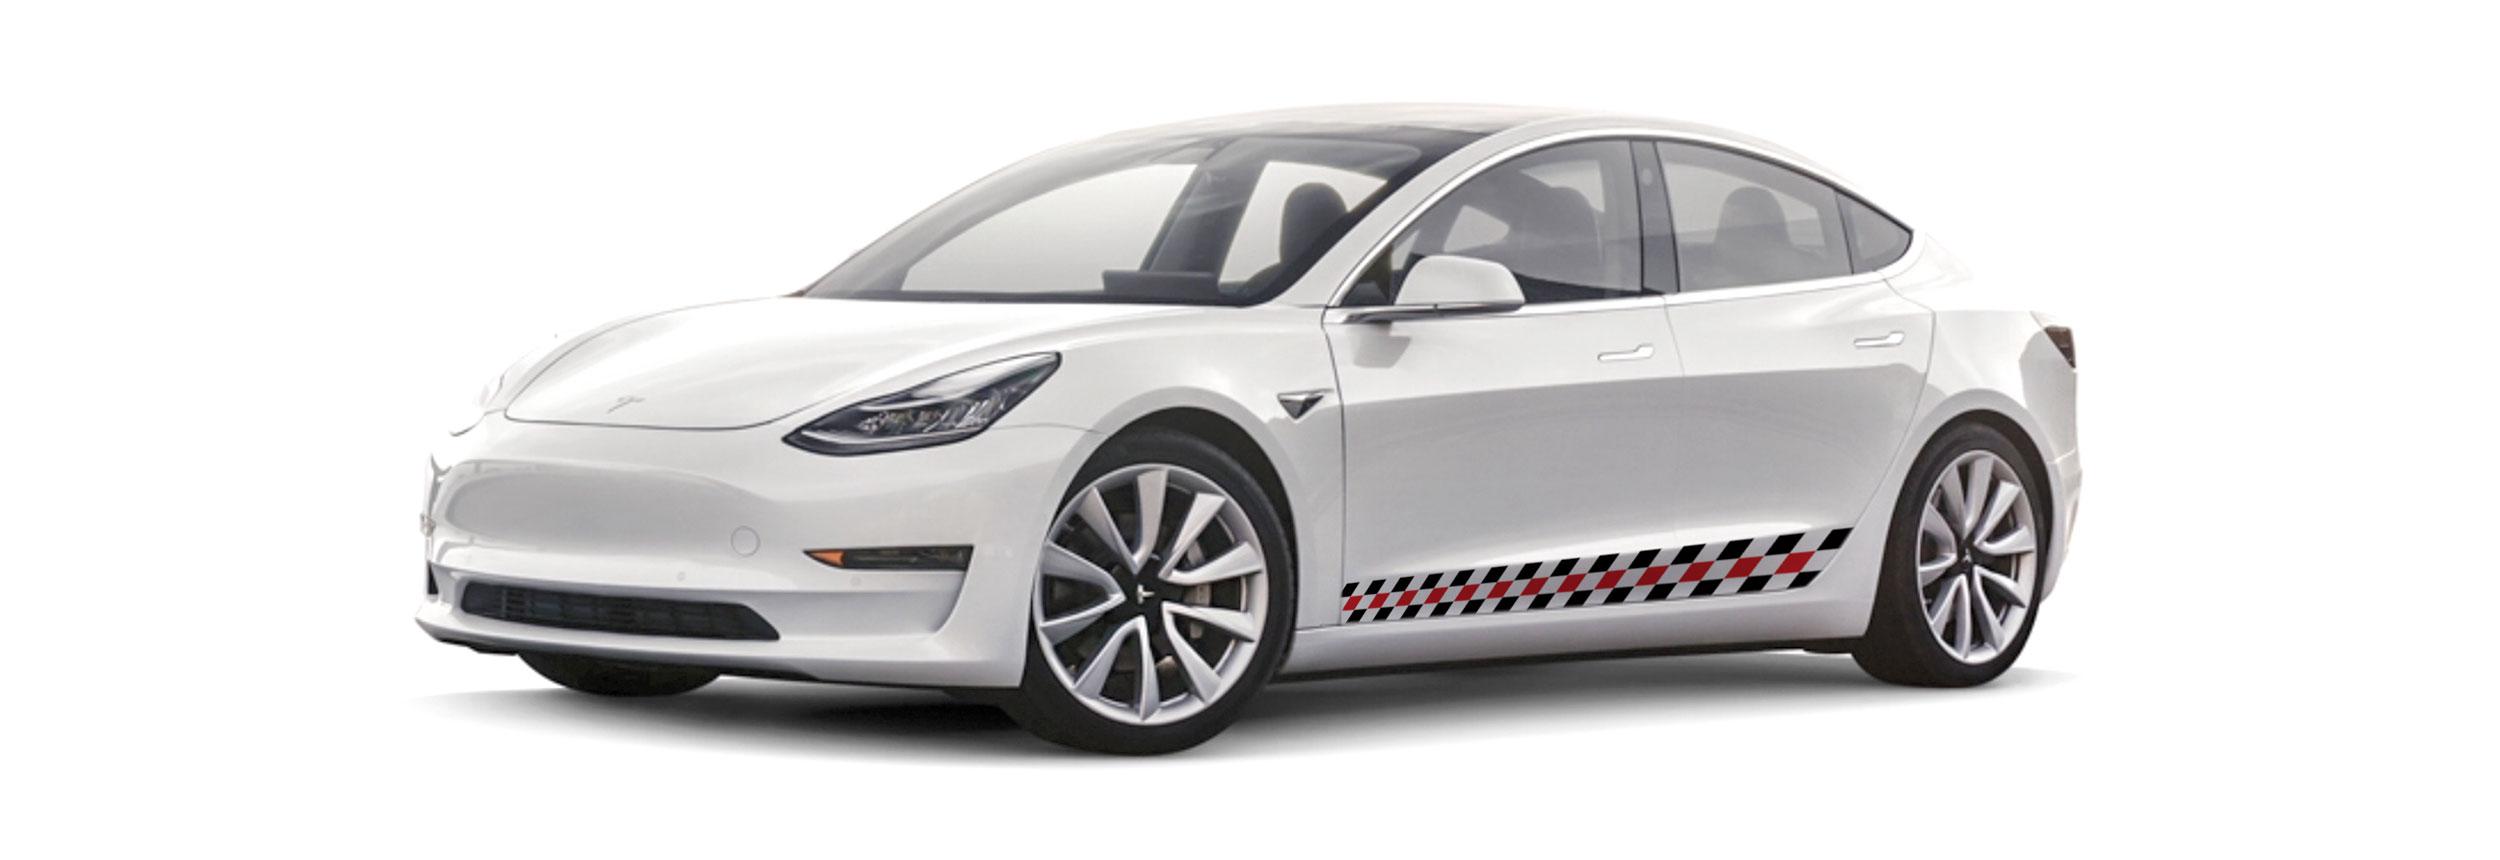 Cooper Coach All Electric Ride Tesla 3